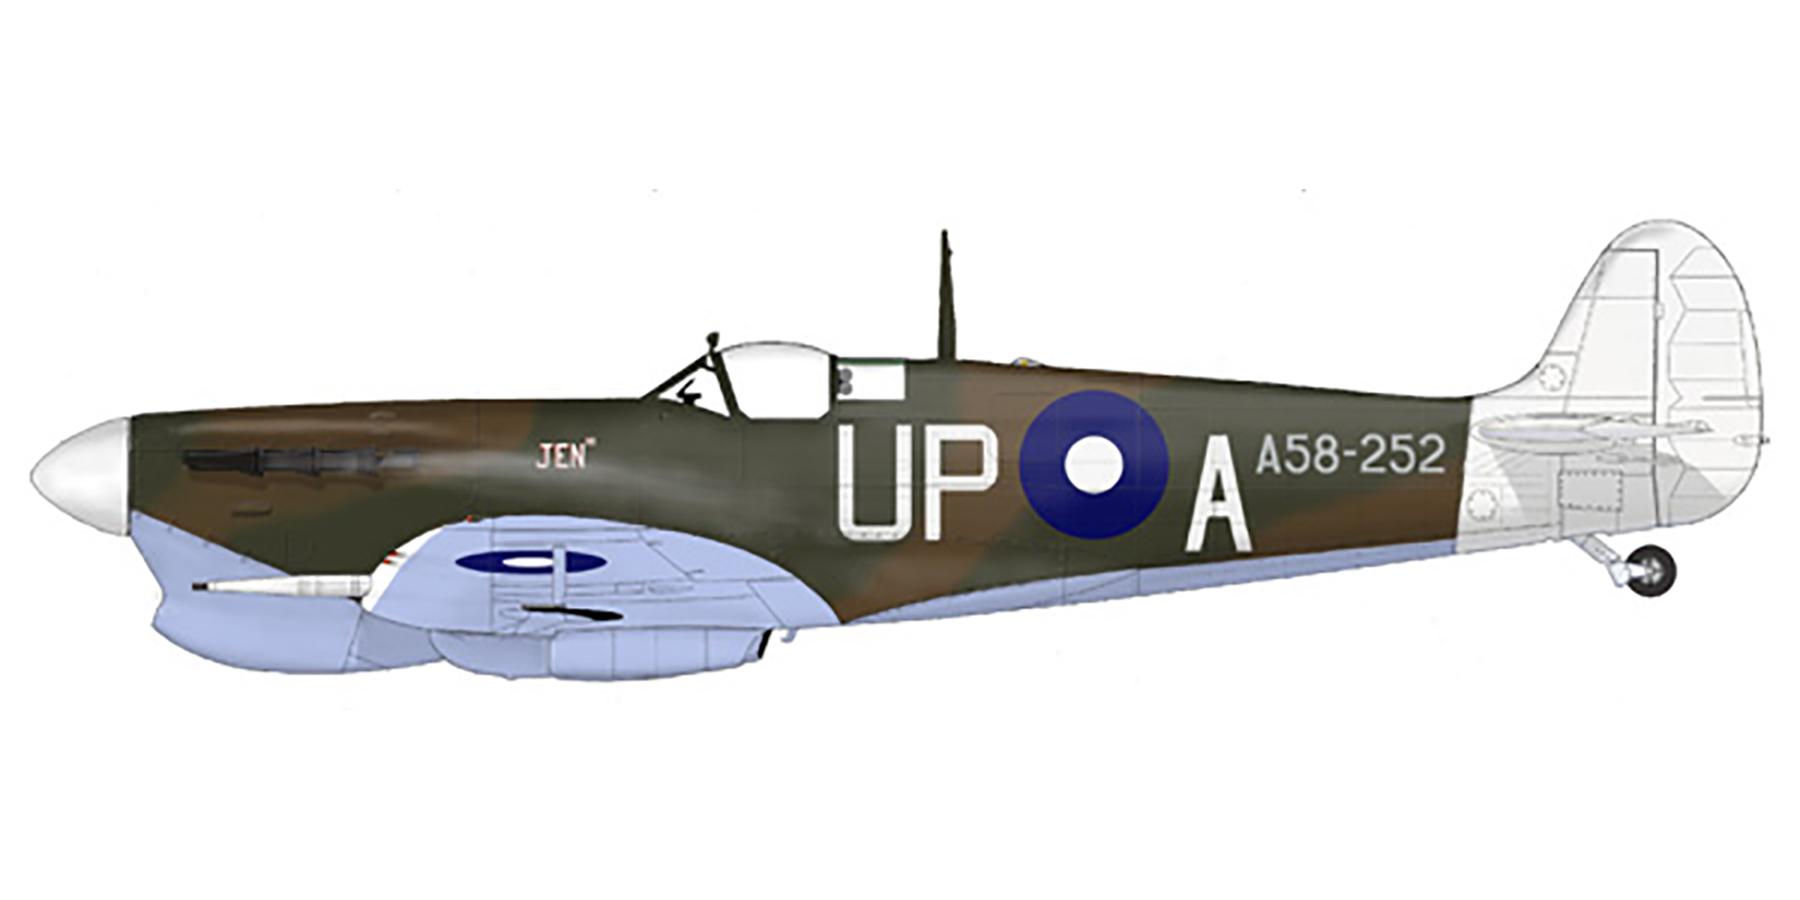 Spitfire MkVcTrop RAAF 79Sqn UPA Stan Galton A58 252 Los Negros Island 1944 0A